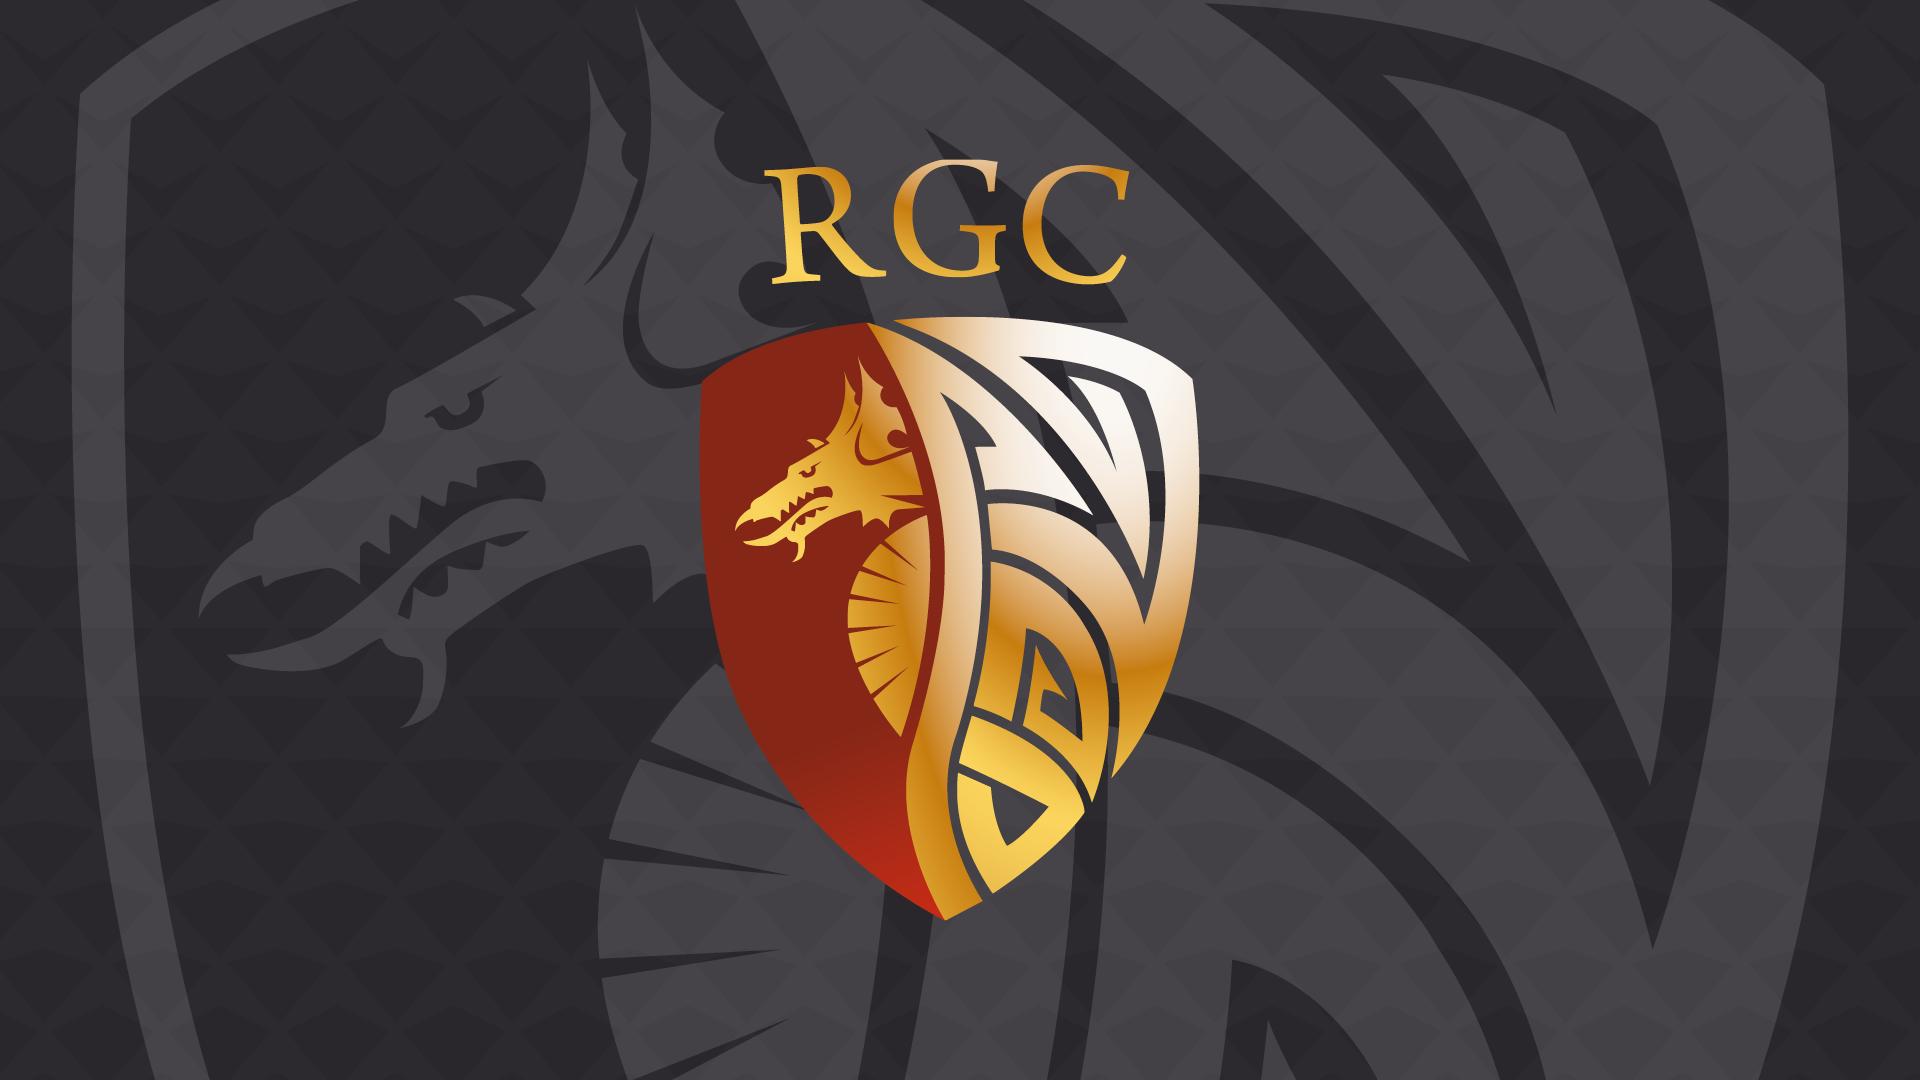 Cardiff Give RGC Wake Up Call